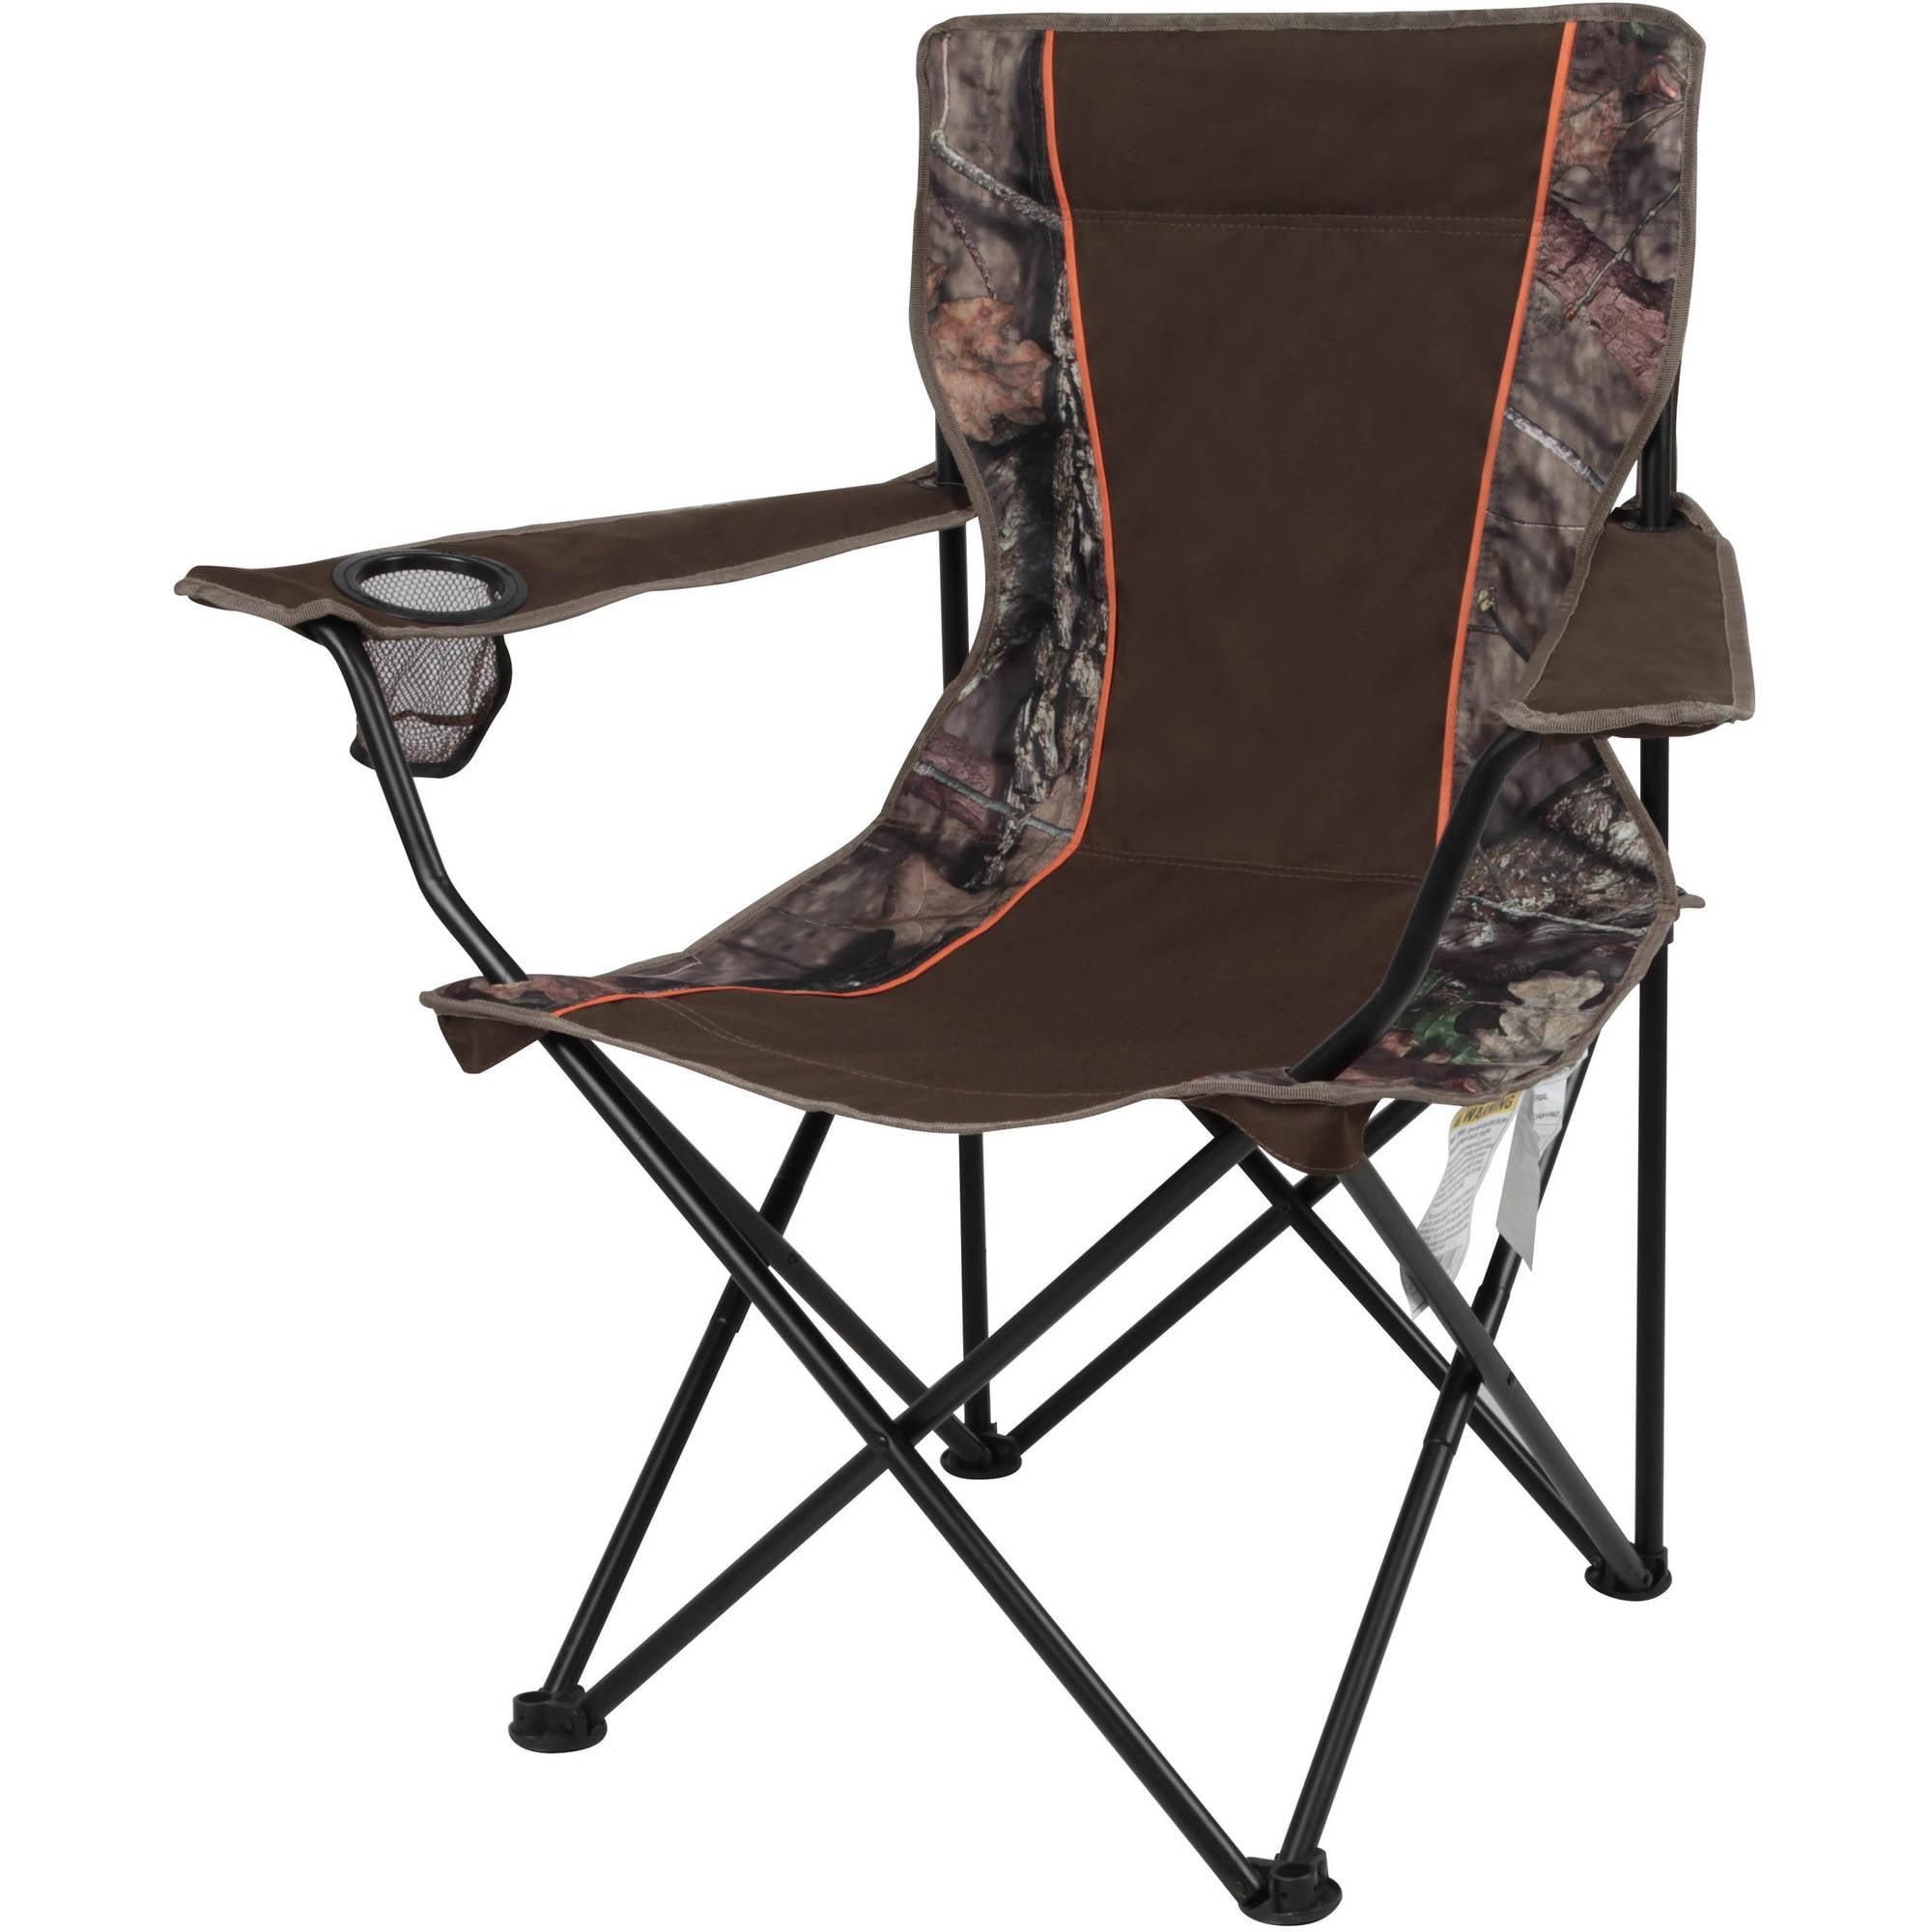 Basic Mossy Oak Camo Chair Walmart